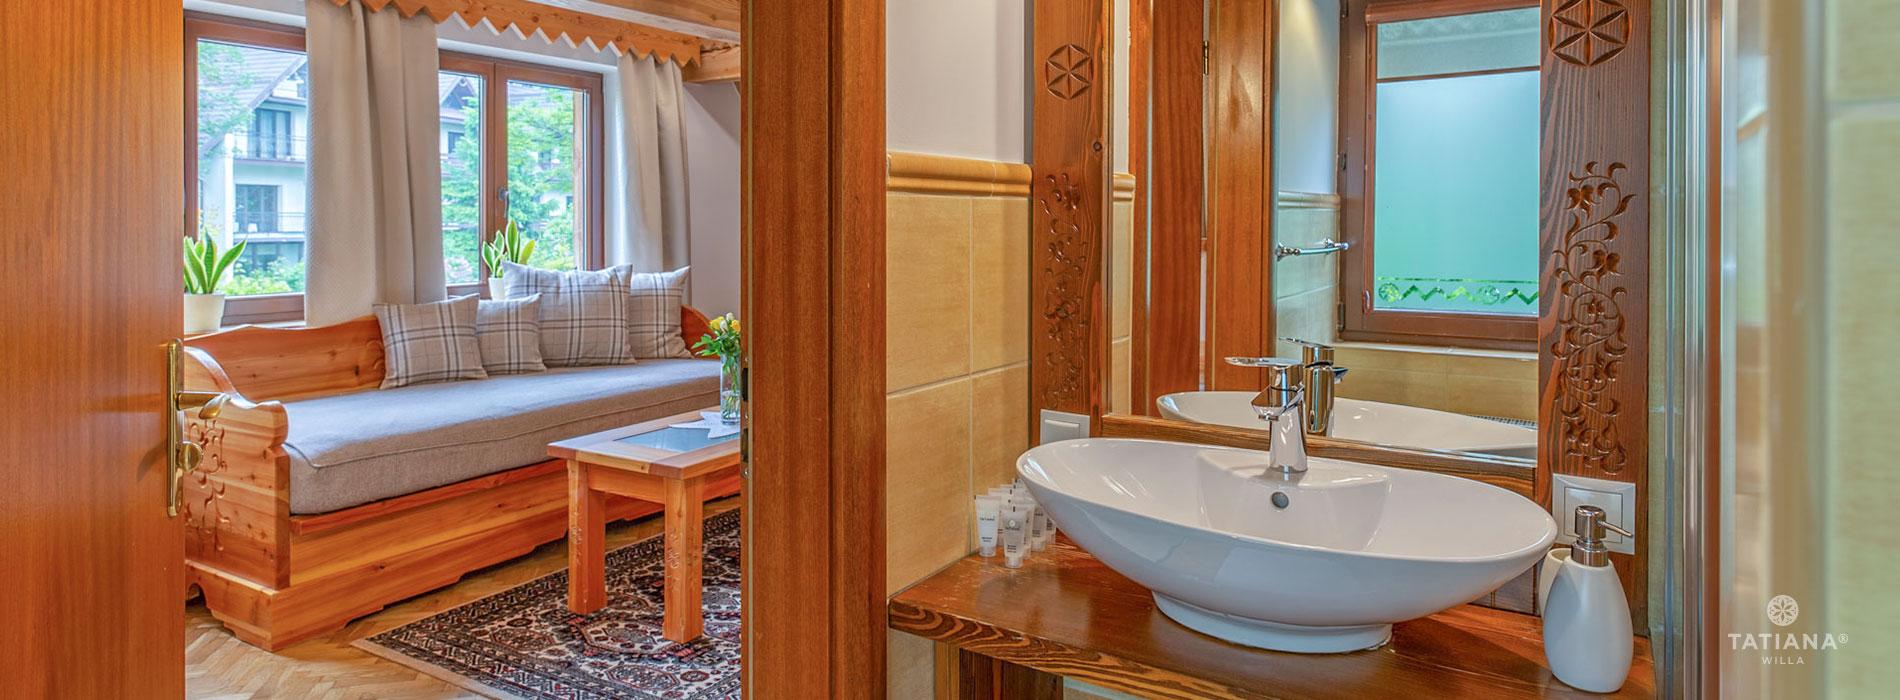 Apartament Premium 8 - łazienka